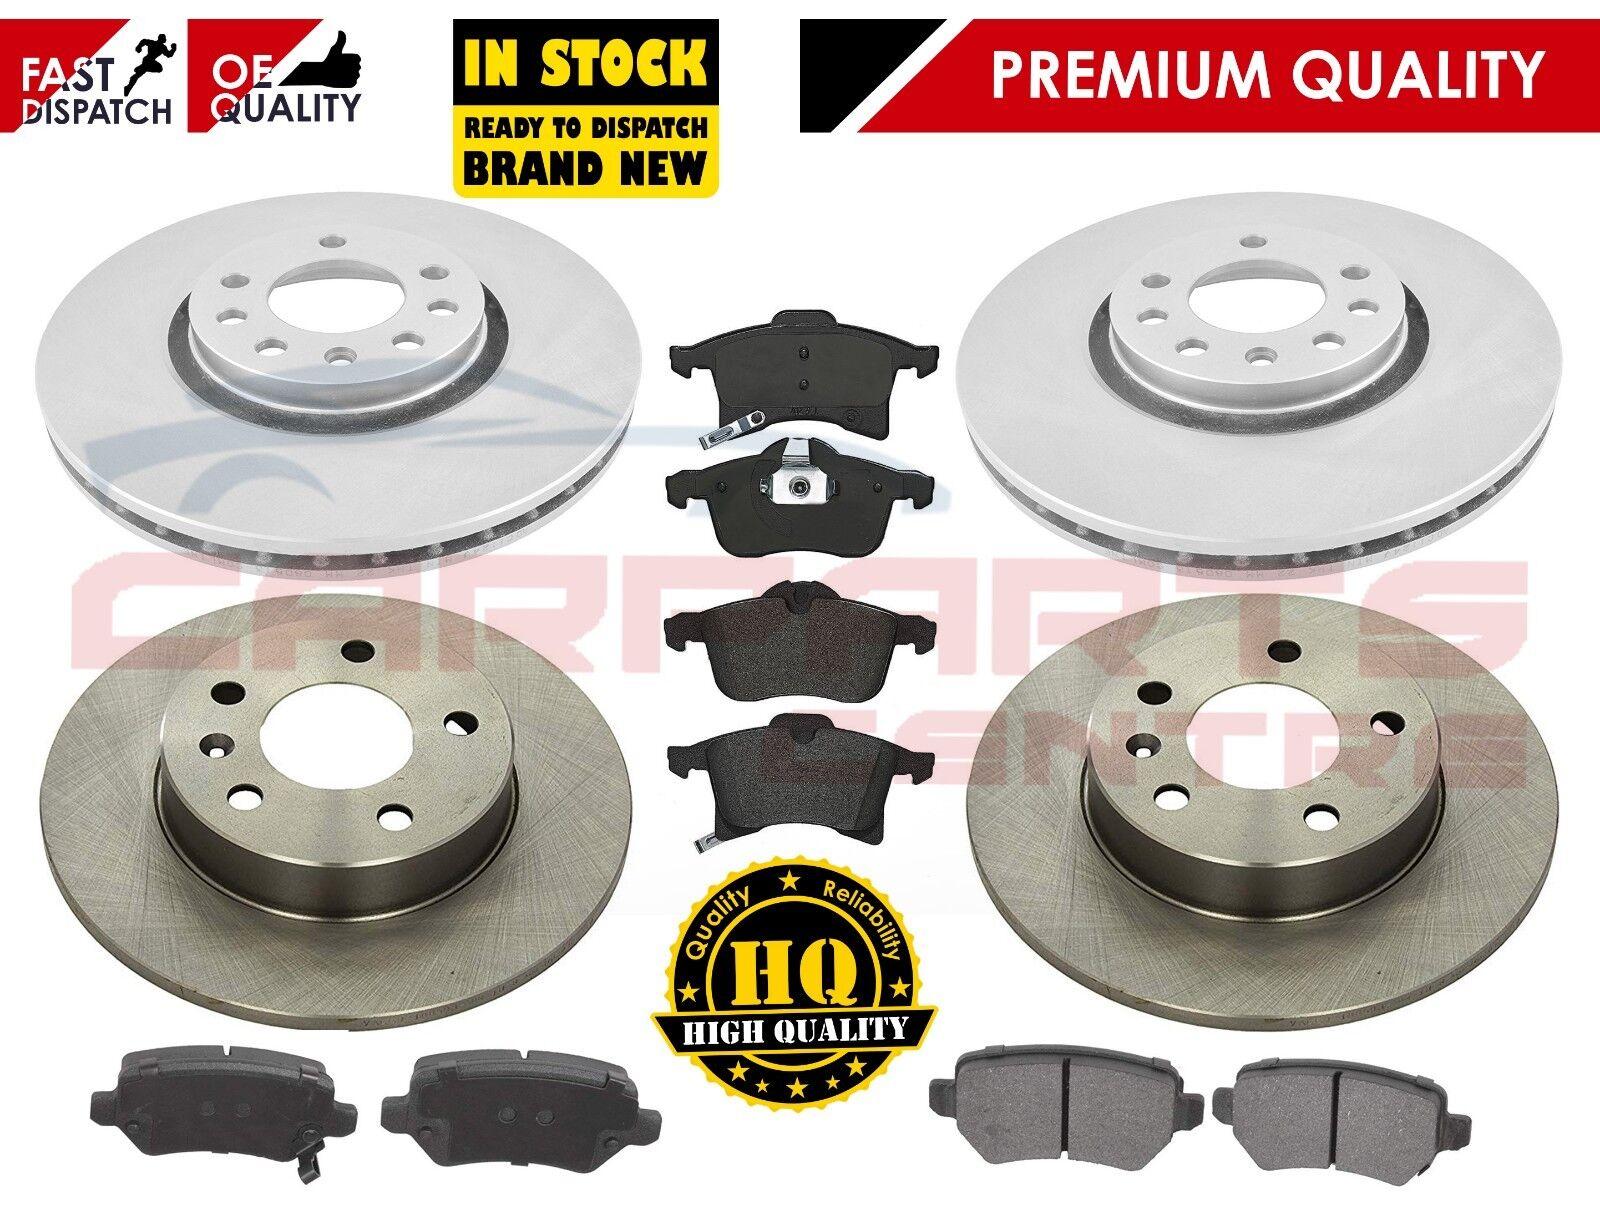 Brake Discs 264mm Solid Vauxhall Zafira 2.2 16V 2.2 D 1.7 CDTI Rear Brake Pads